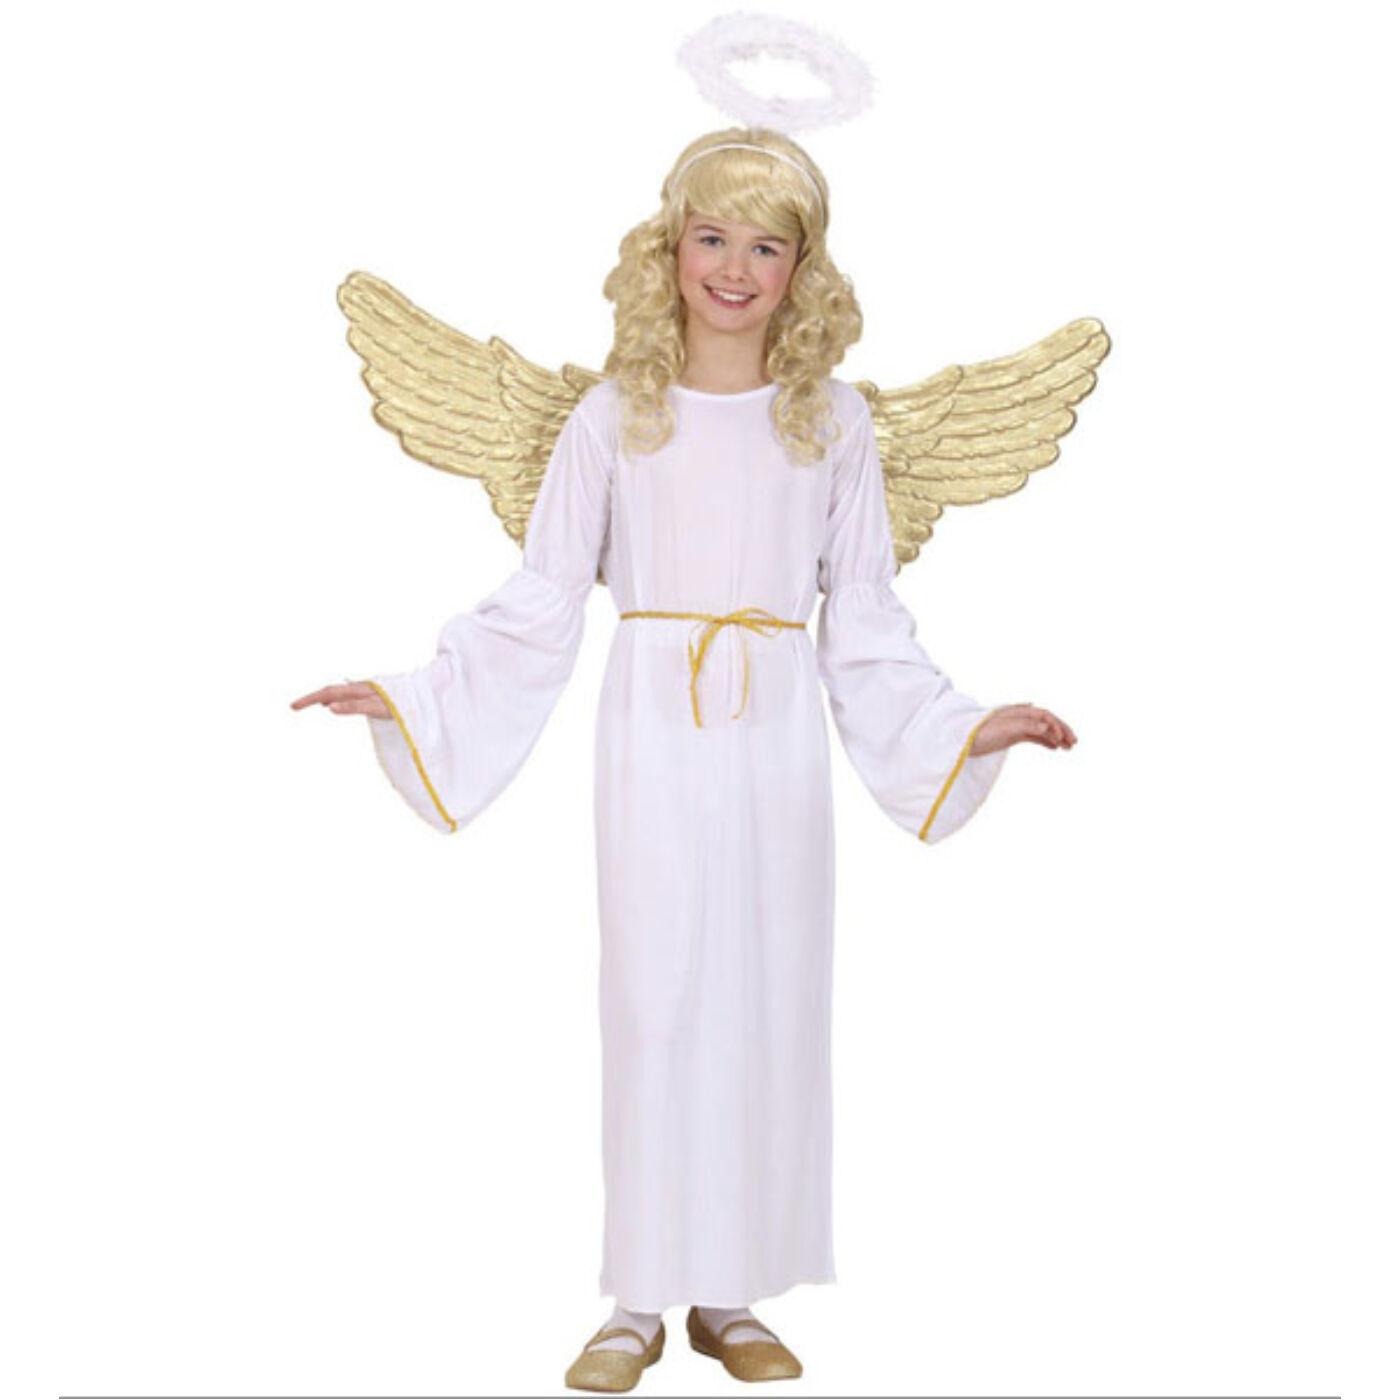 angyal jelmez